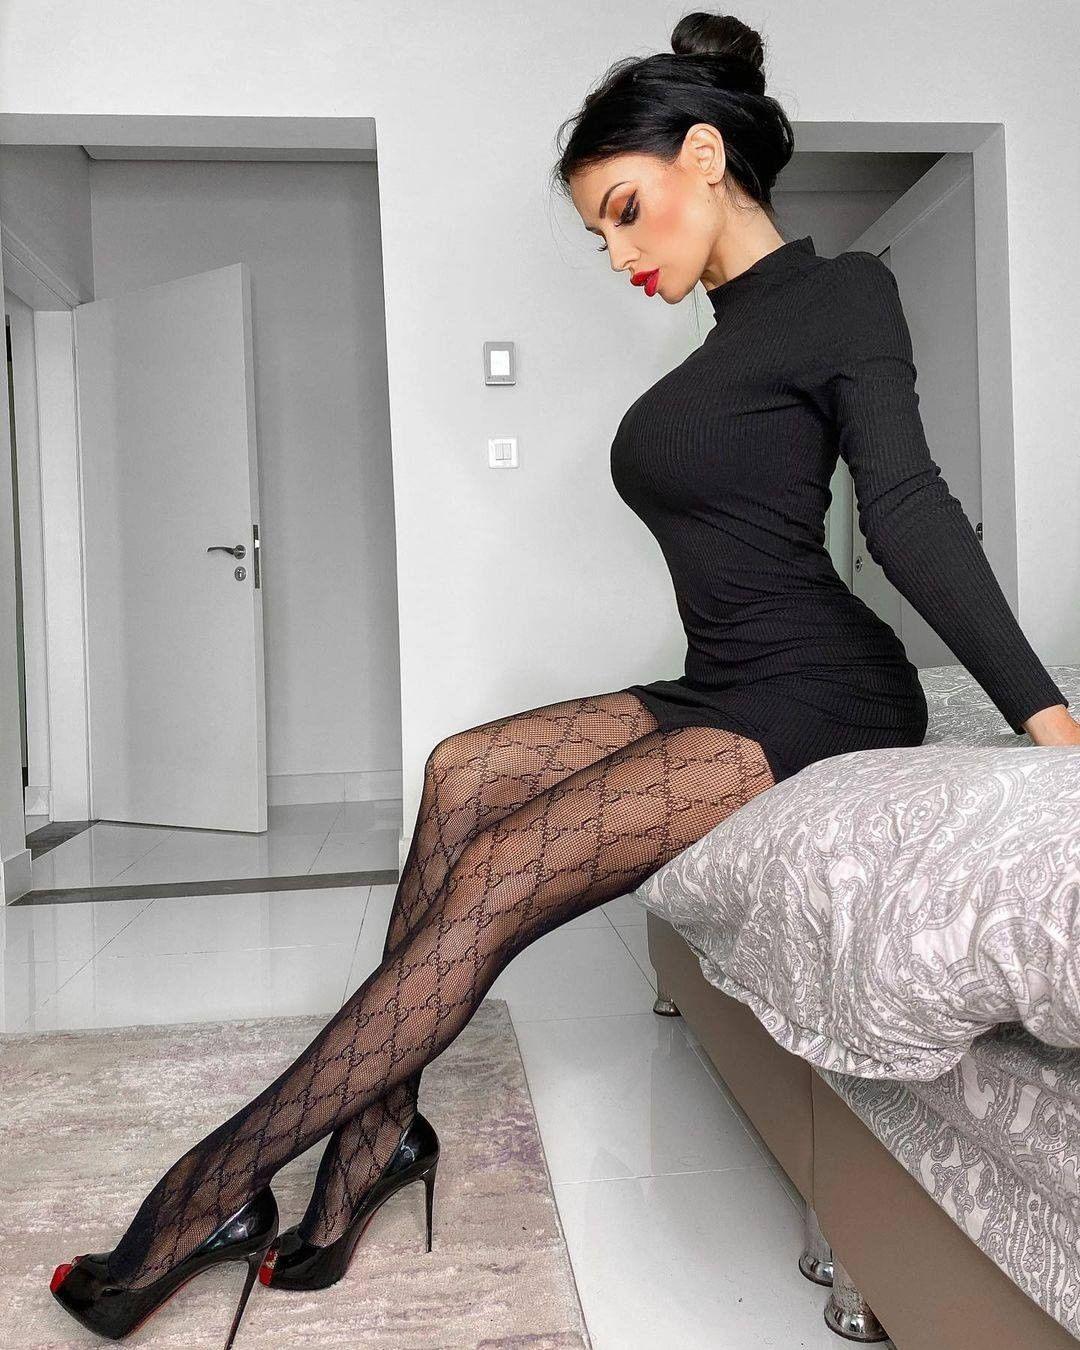 Afbeelding met tags:Unknown, Stockings, Meisje